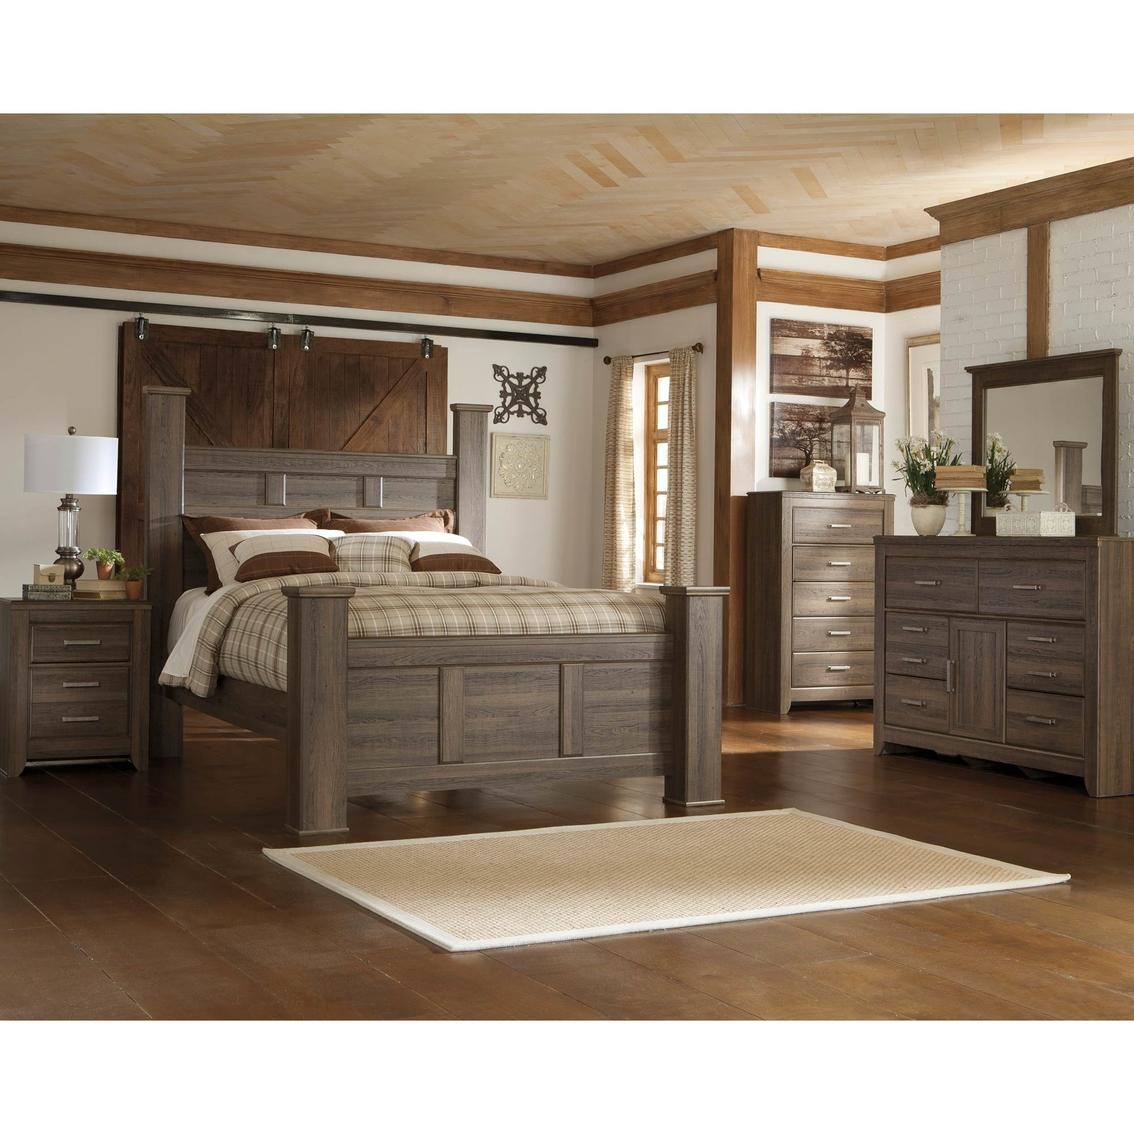 Signature Design By Ashley Juararo 5 Pc Bedroom Set Bedroom Sets Furniture Appliances Shop The Exchange